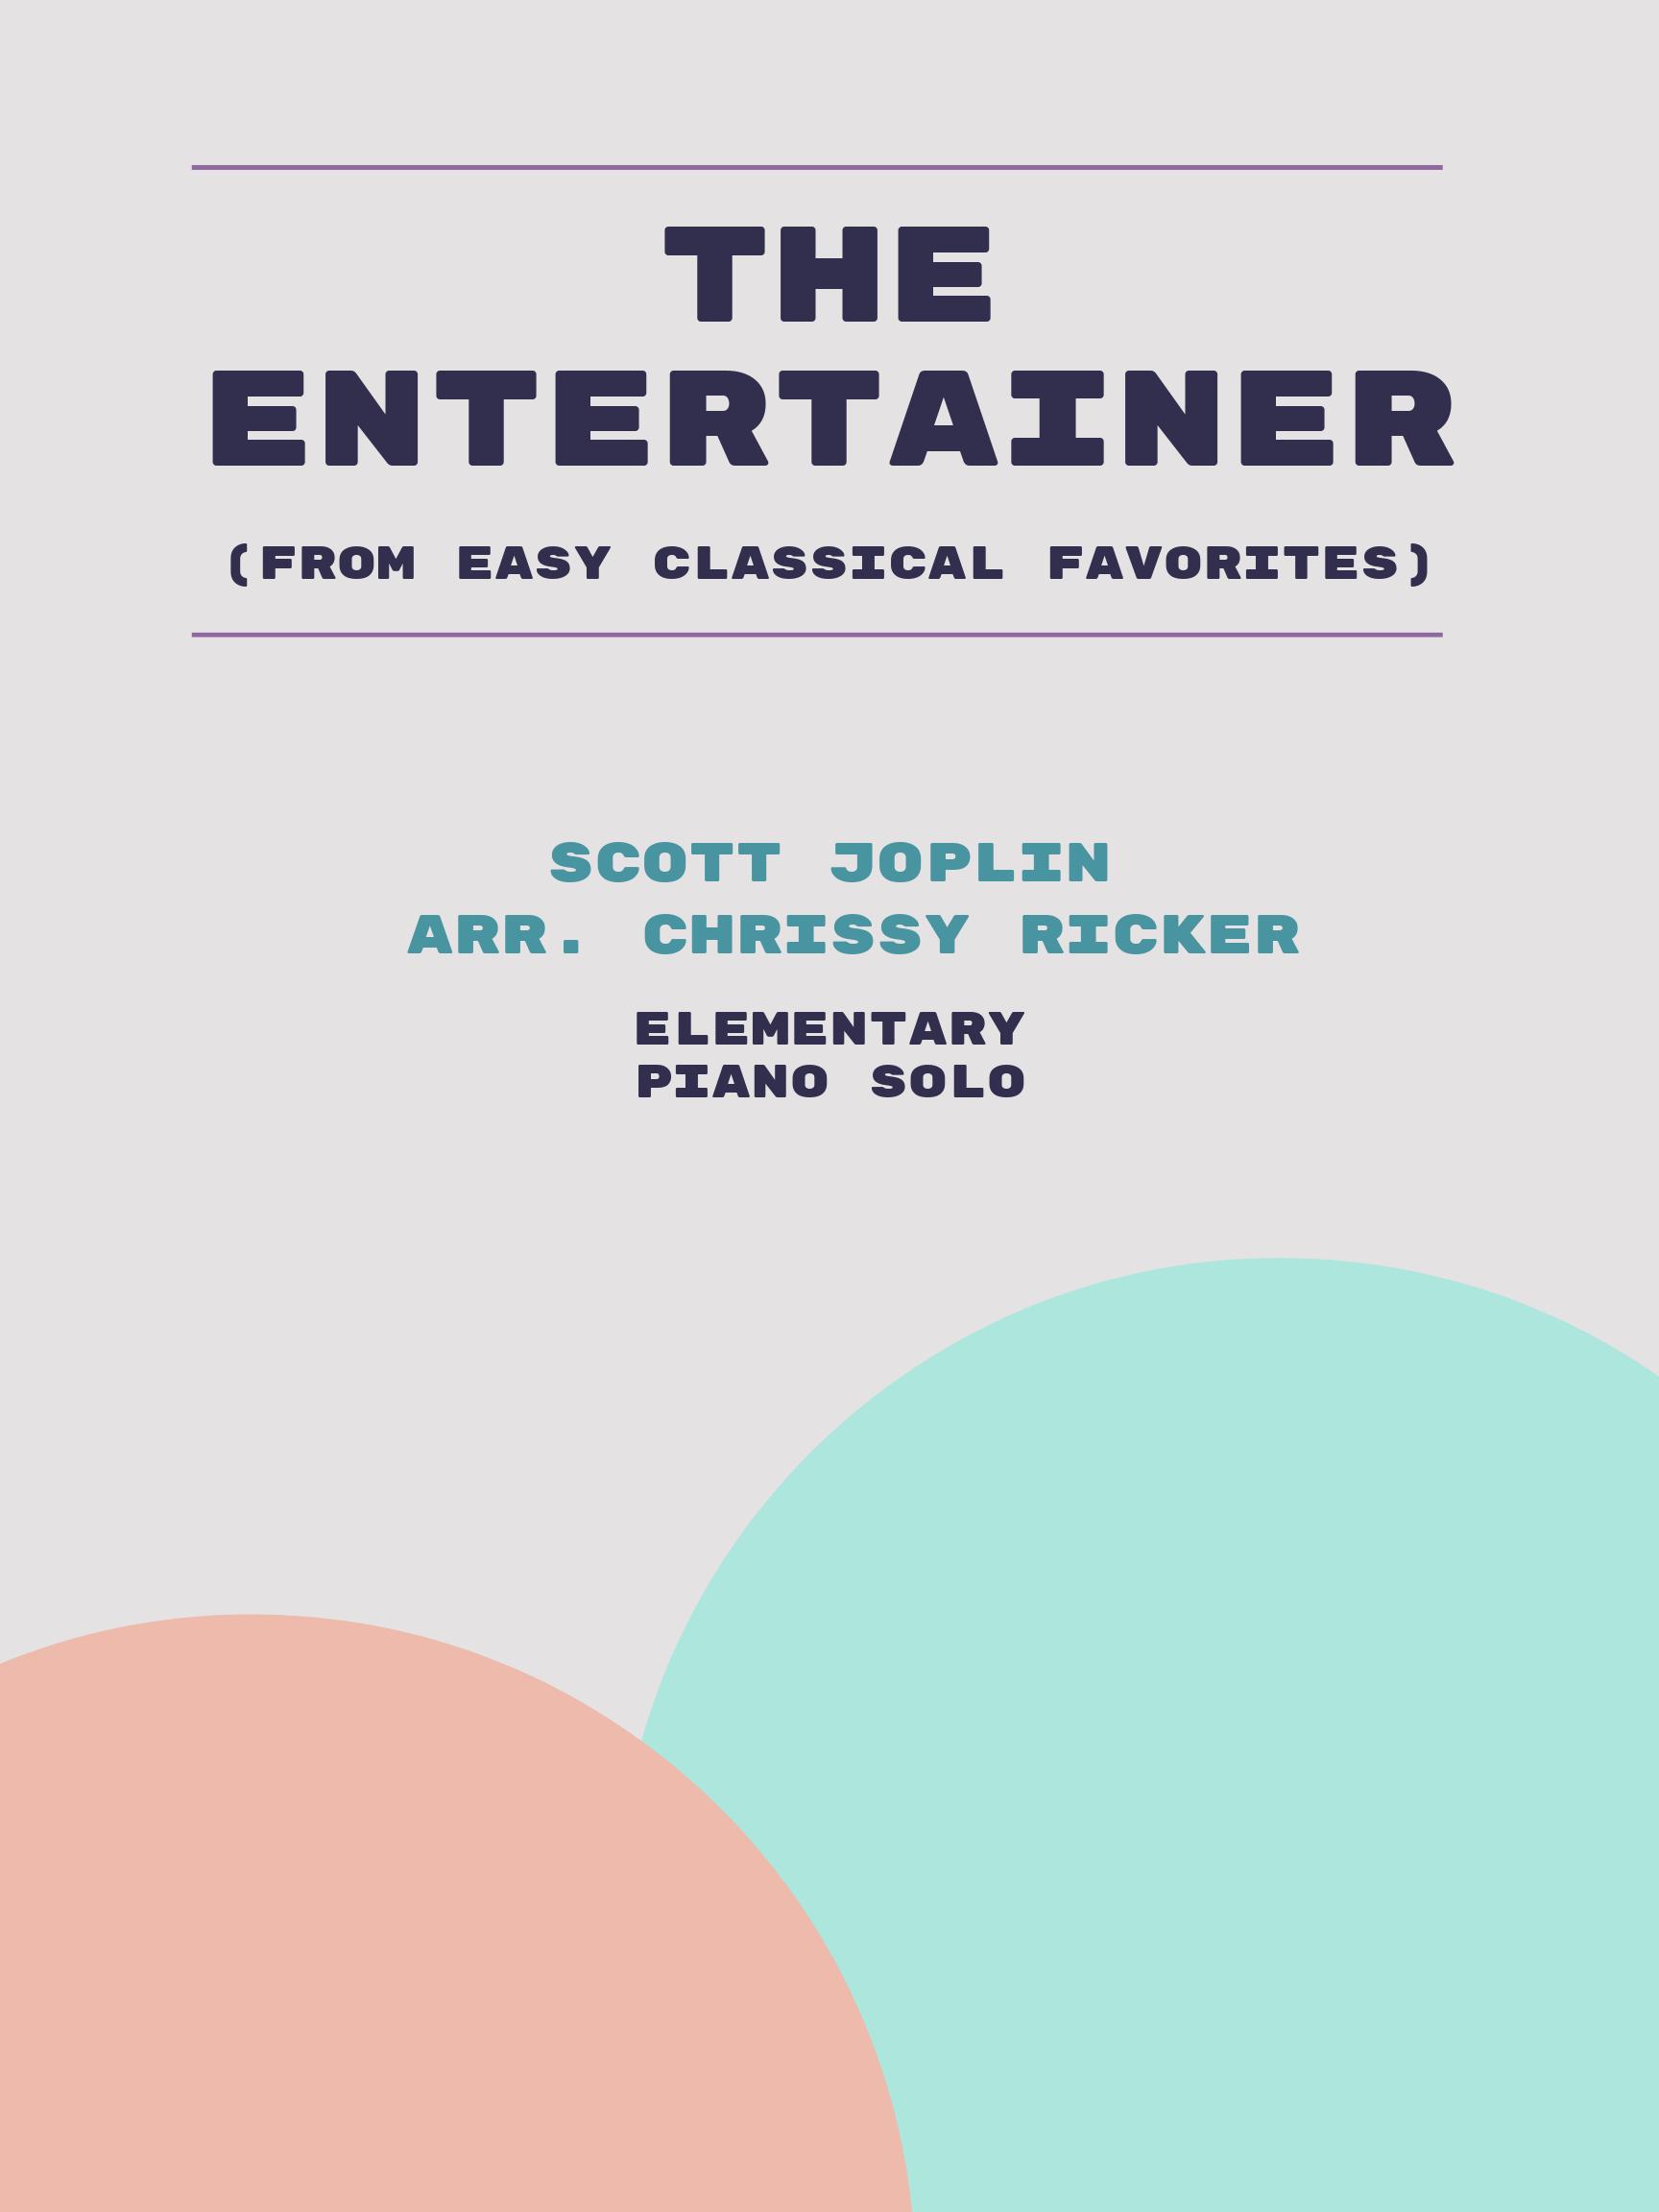 The Entertainer by Scott Joplin